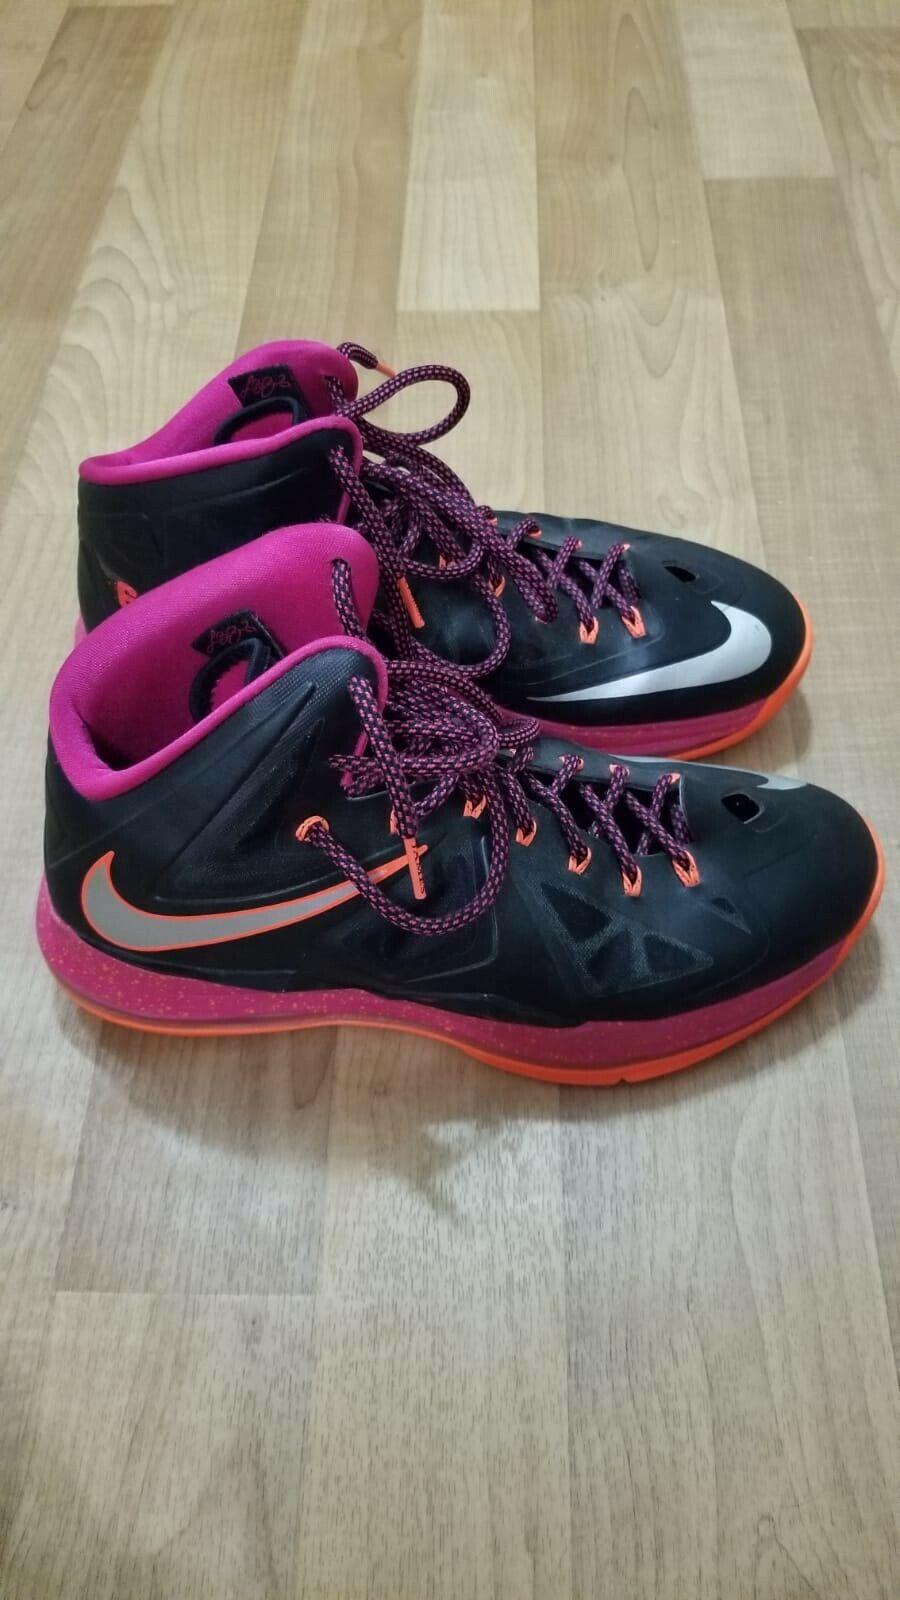 Nike Lebron X Floridians 541100-005 Black Fireberry MEN SZ 11.5 US PREOWNED